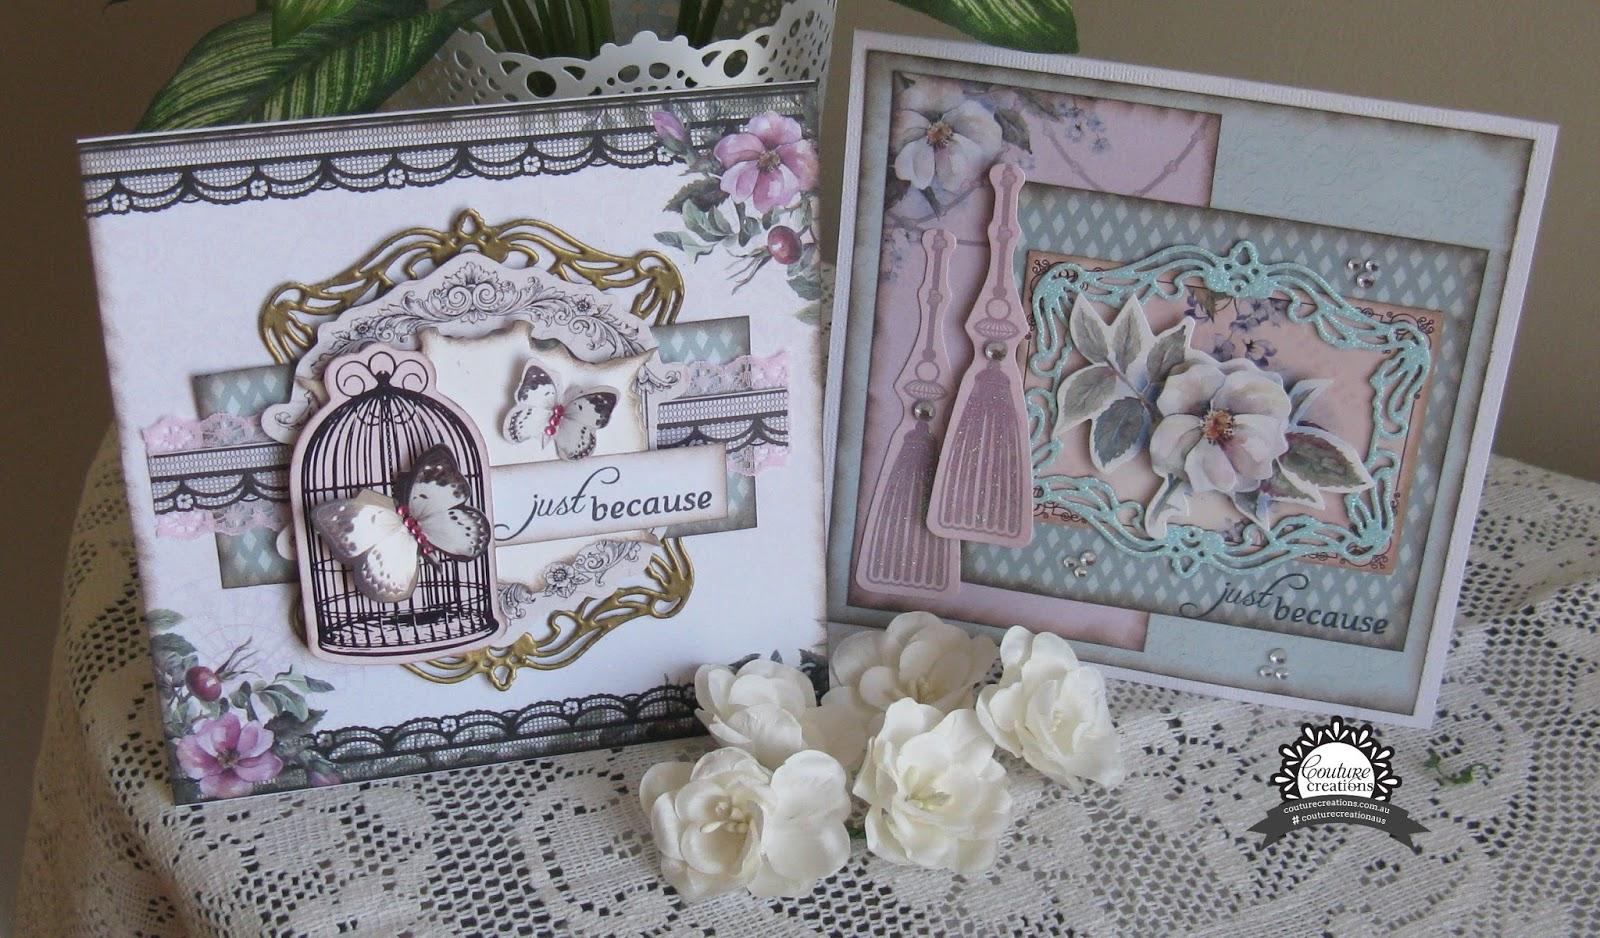 Ultimate Crafts MAGNOLIA LANE /'DIECUT EPHEMERA SET/' Embellishments Die Cuts